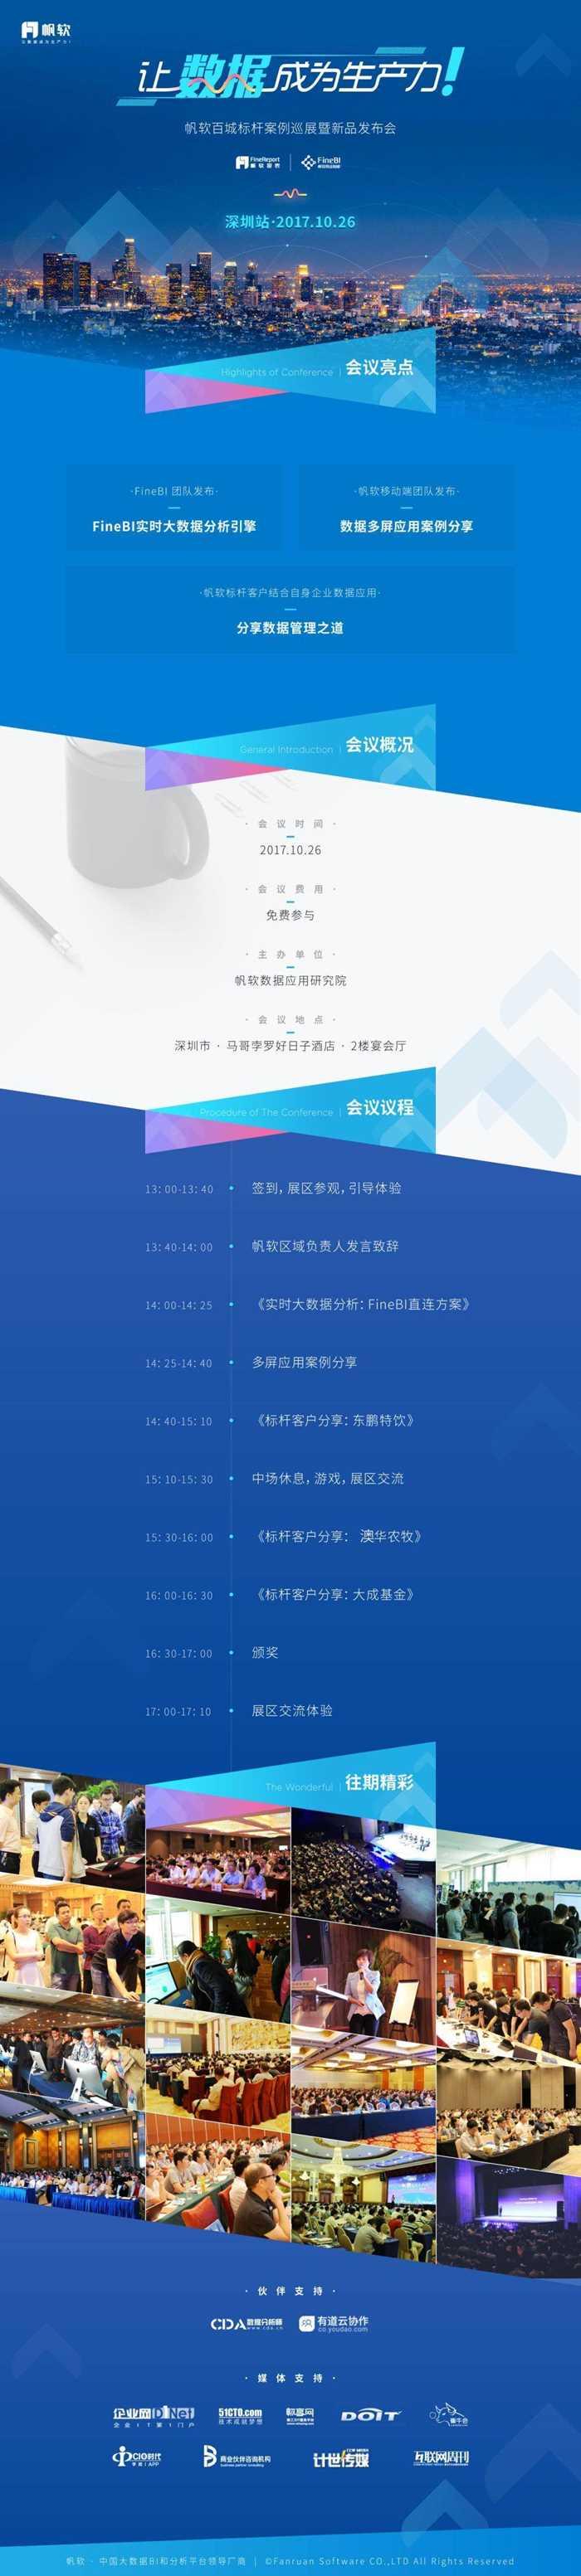 web邀请_深圳站@2.2.jpg